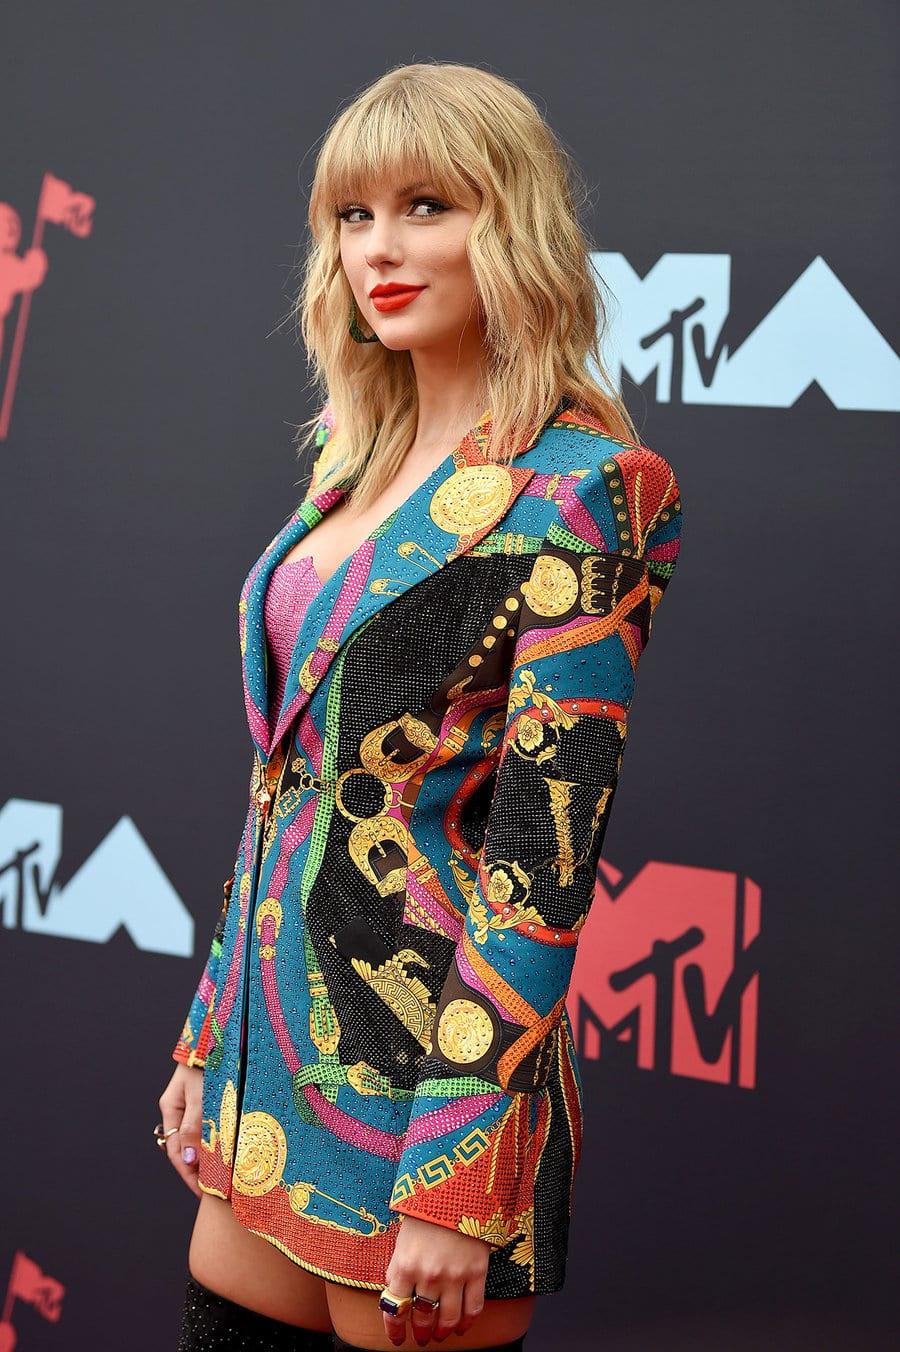 Taylor Swift, Taylor, Swift, White House, Response